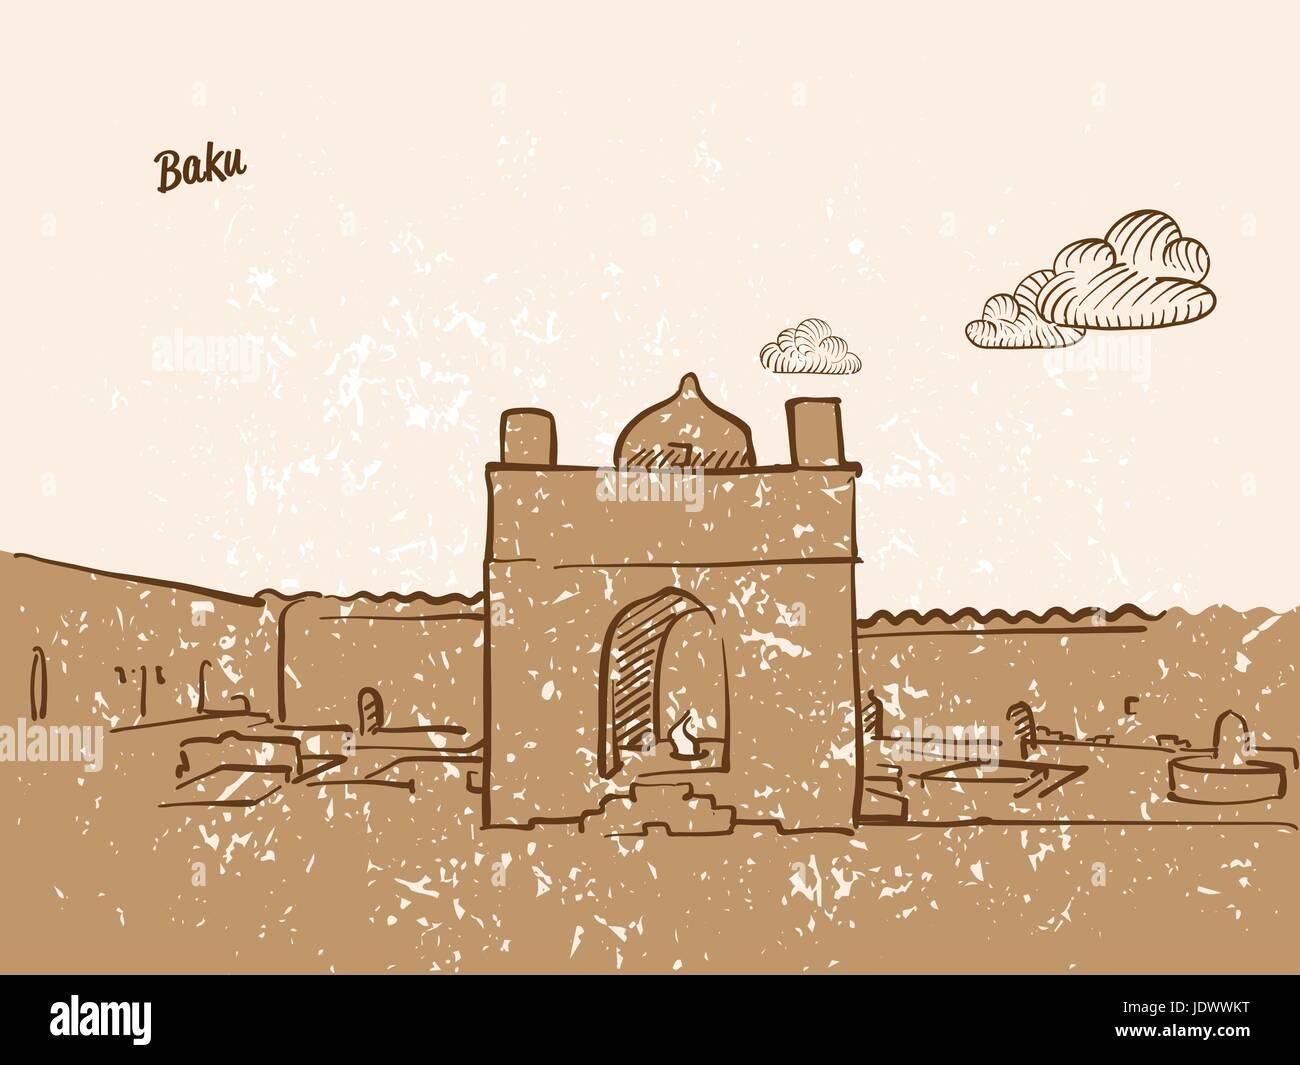 Baku, Azerbaijan, Greeting Card, hand drawn image, famous european capital, vintage style, vector Illustration - Stock Vector